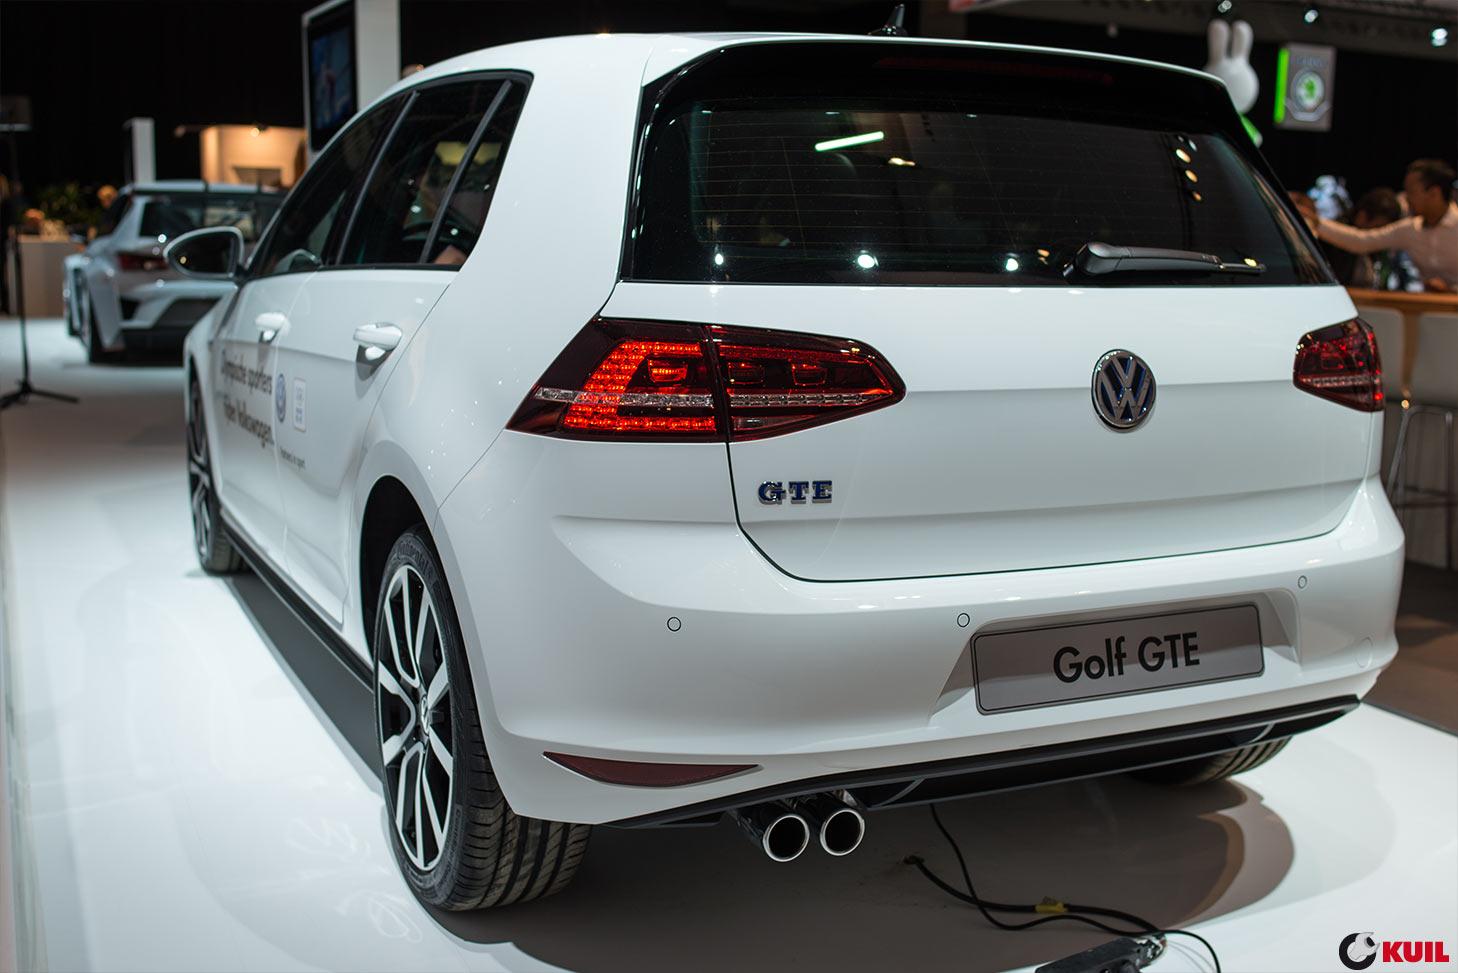 Volkswagen Golf 7 Gte Kuil Banden Blog